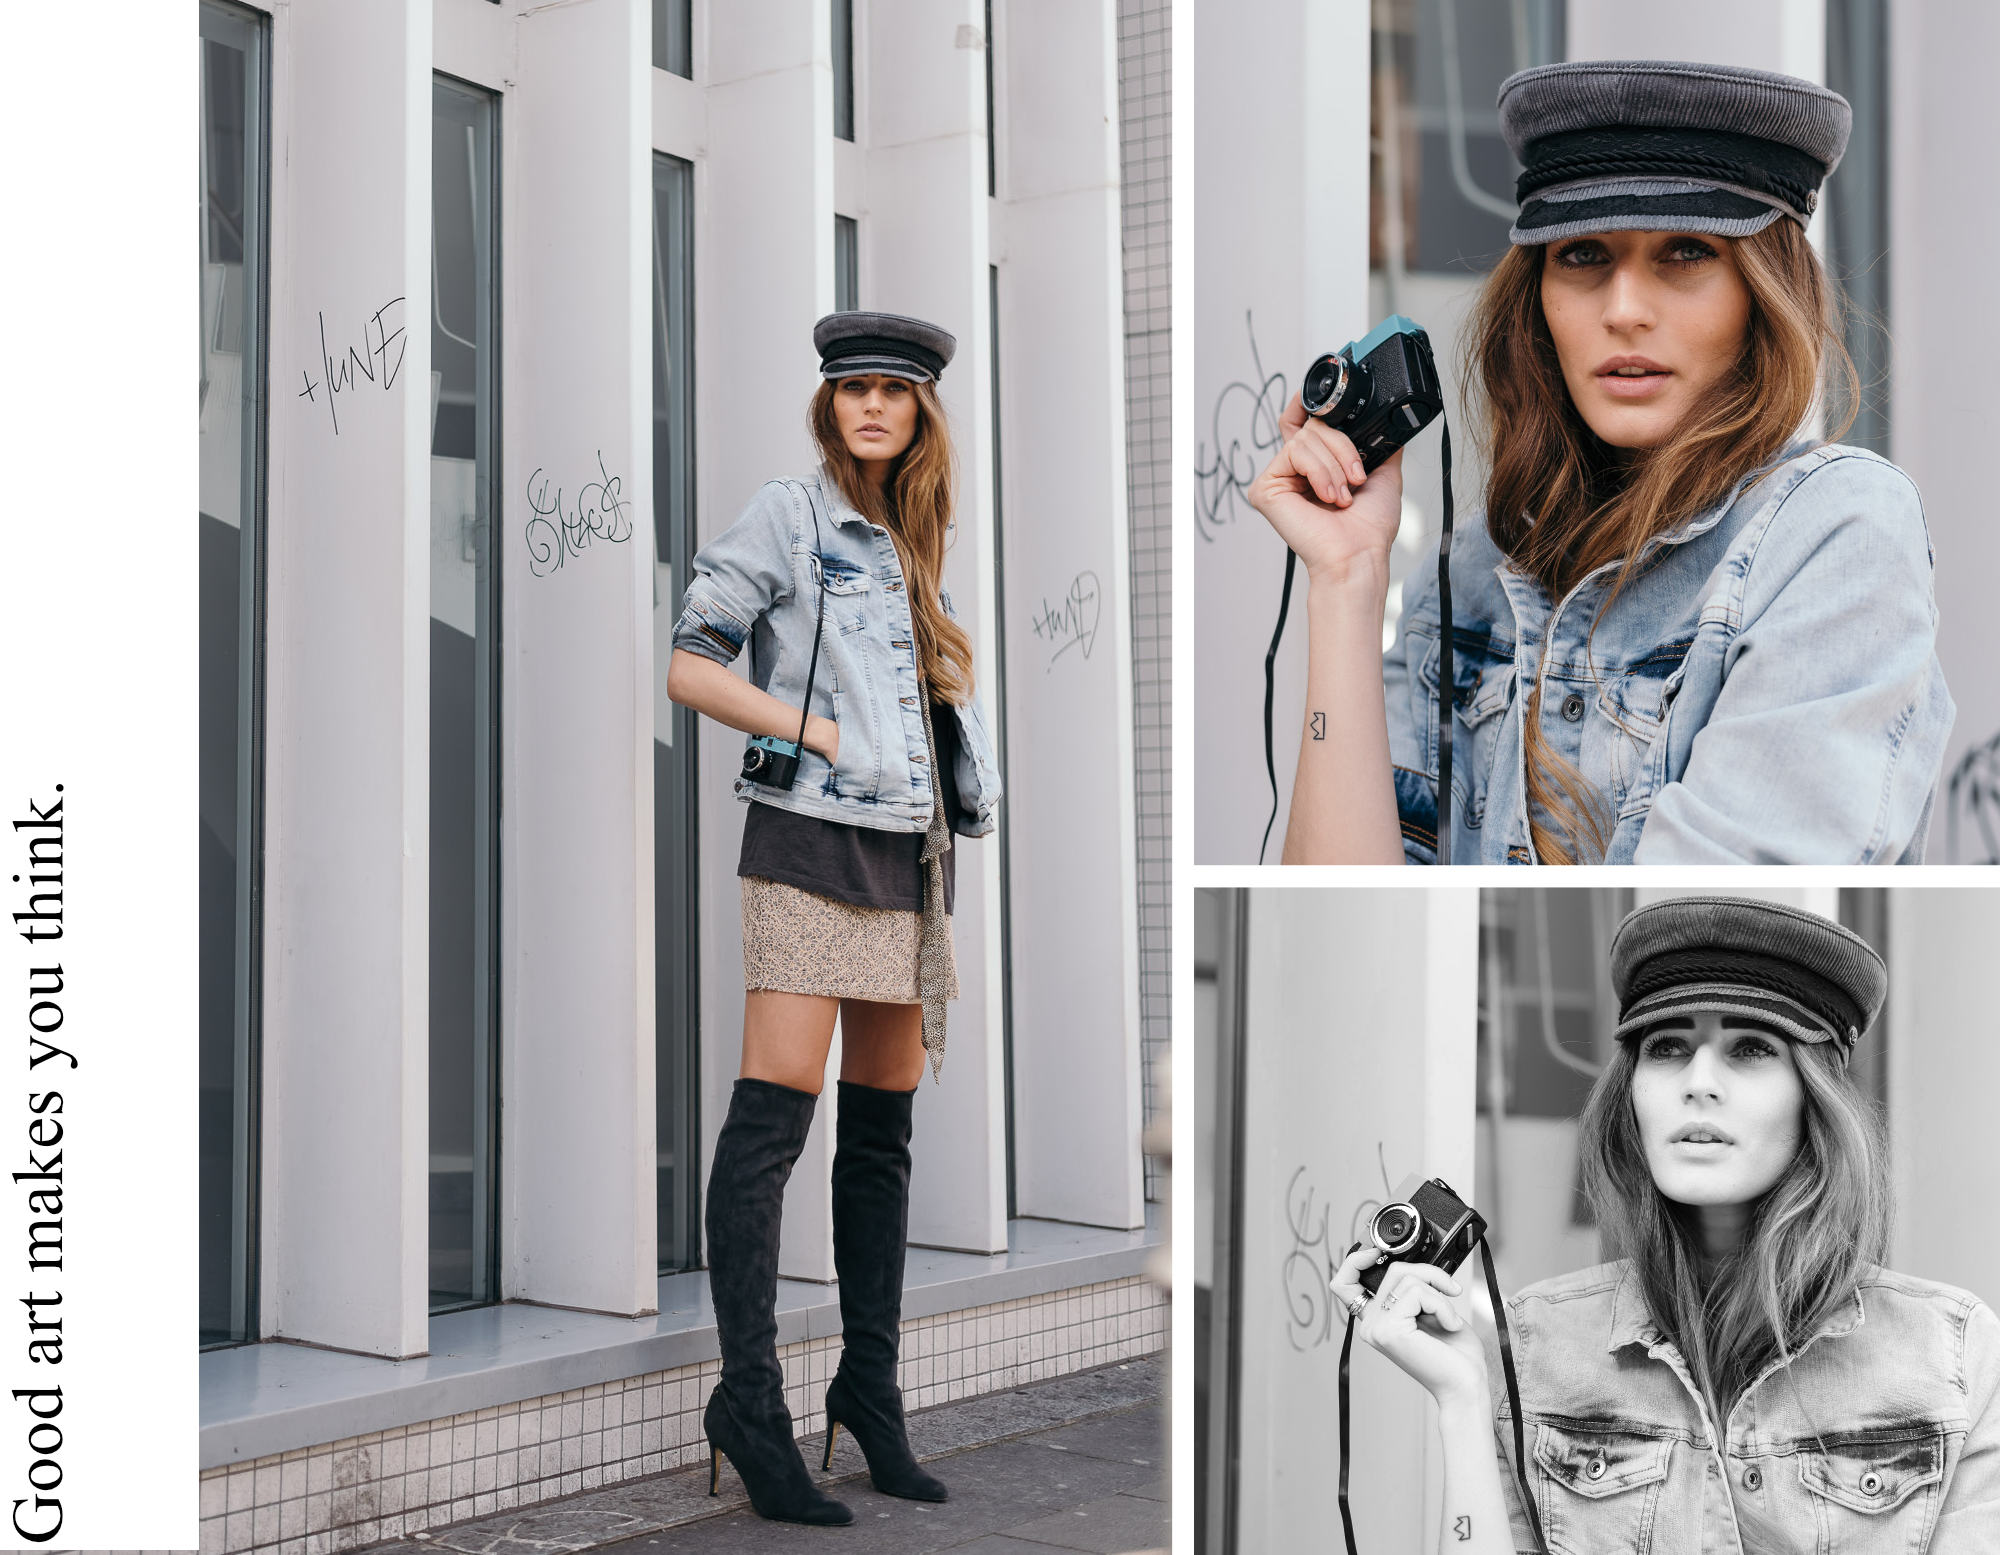 Esprit #ImEsprit Campaign | Lisa Fiege